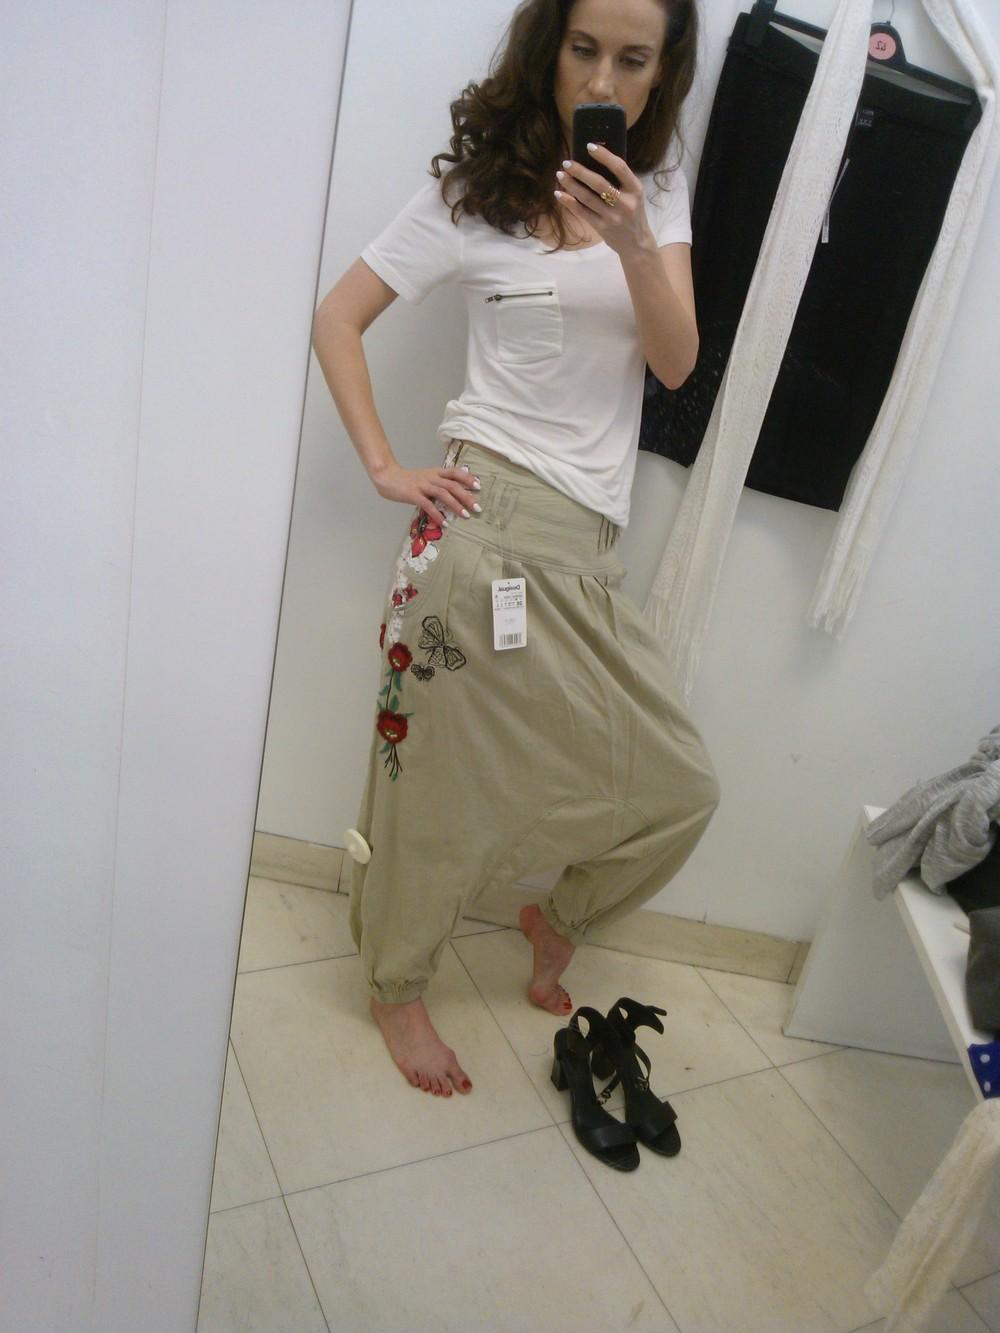 Tieto nohavice? V mojom veku? Na mne?